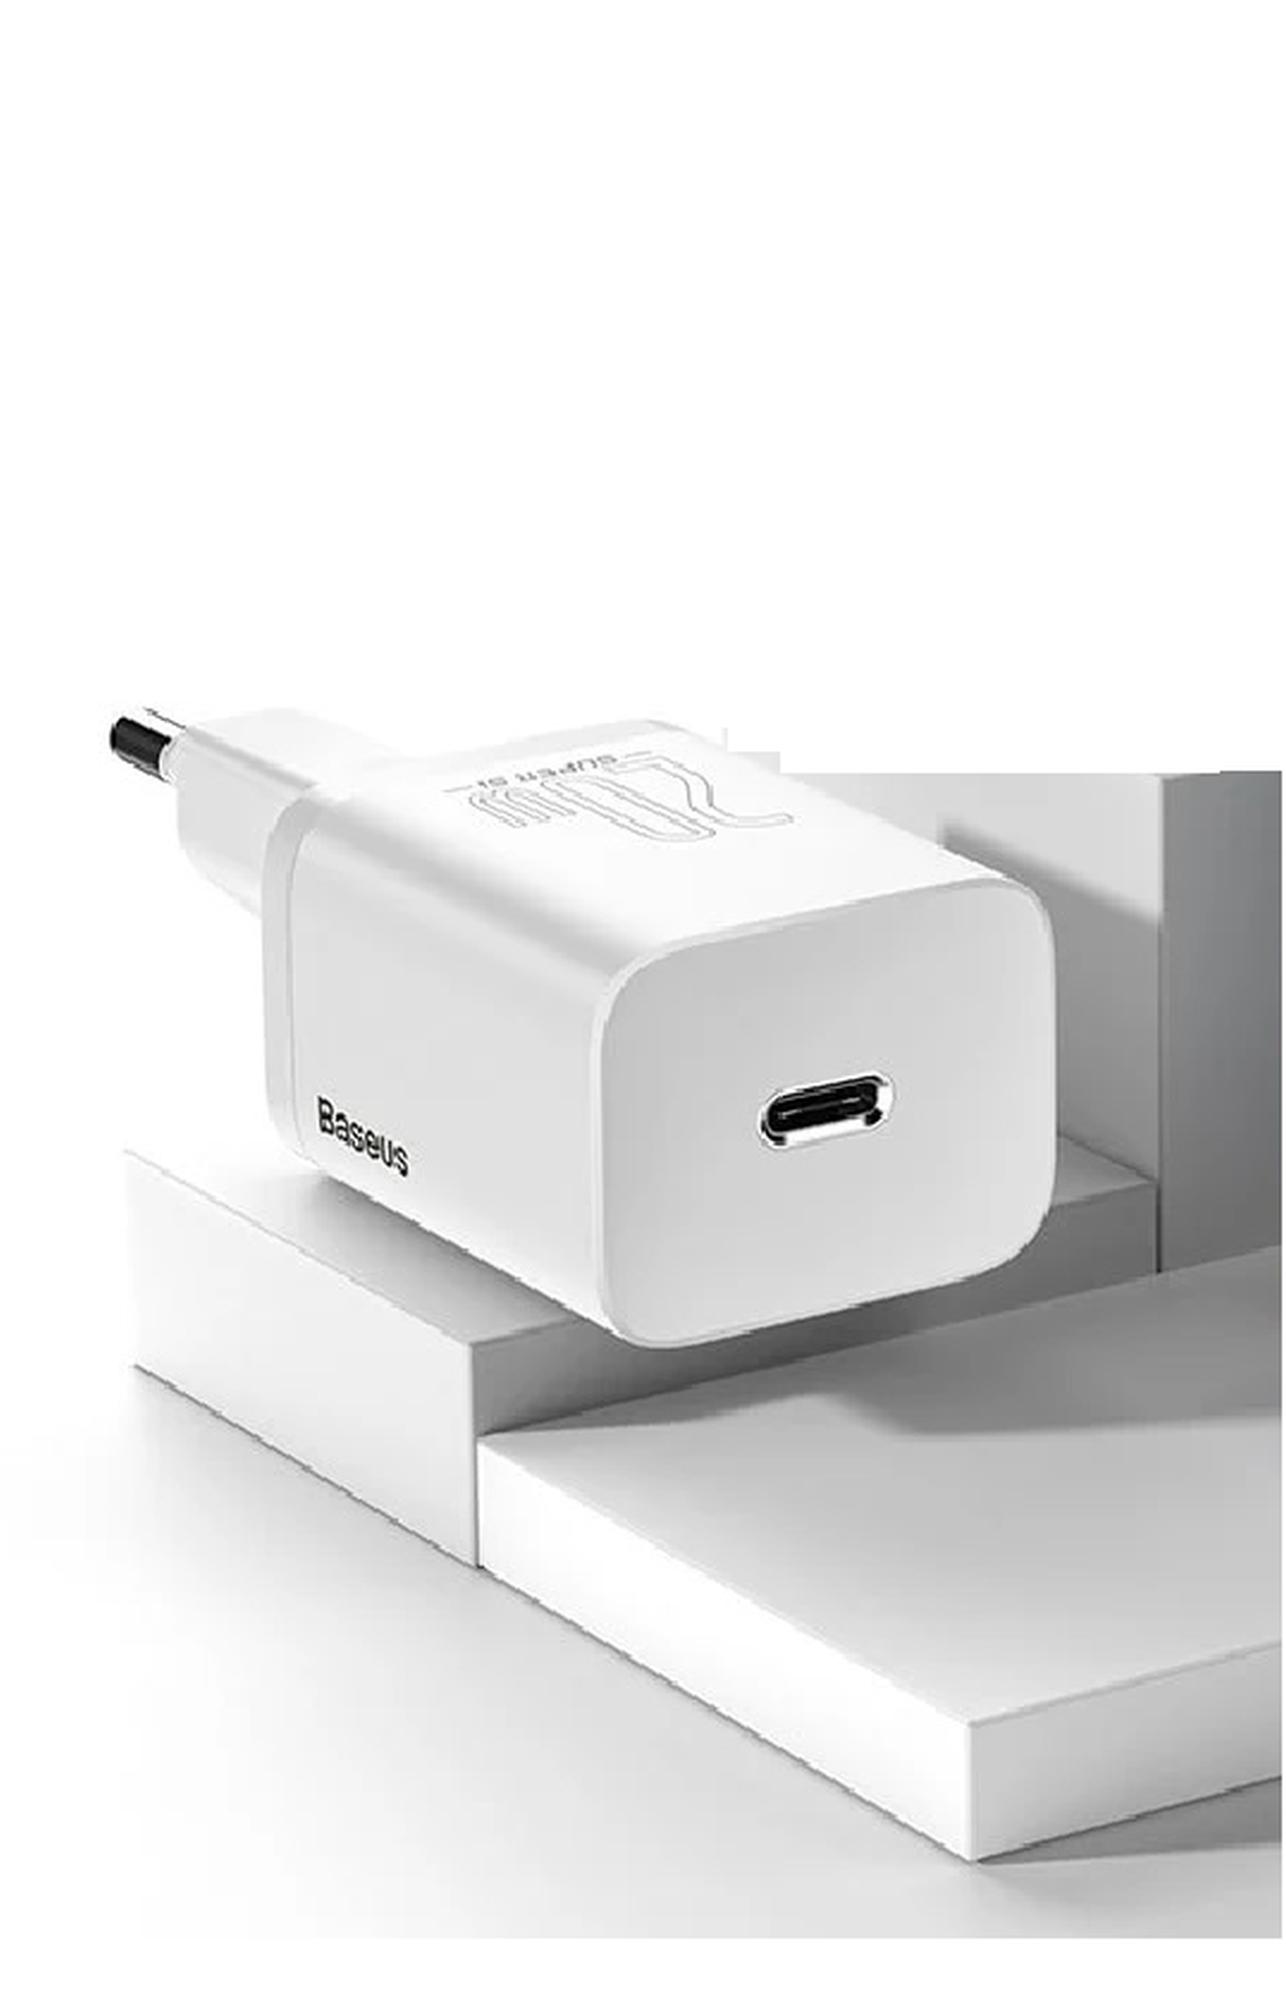 Baseus Super Si Quick Charger 1C 20W White